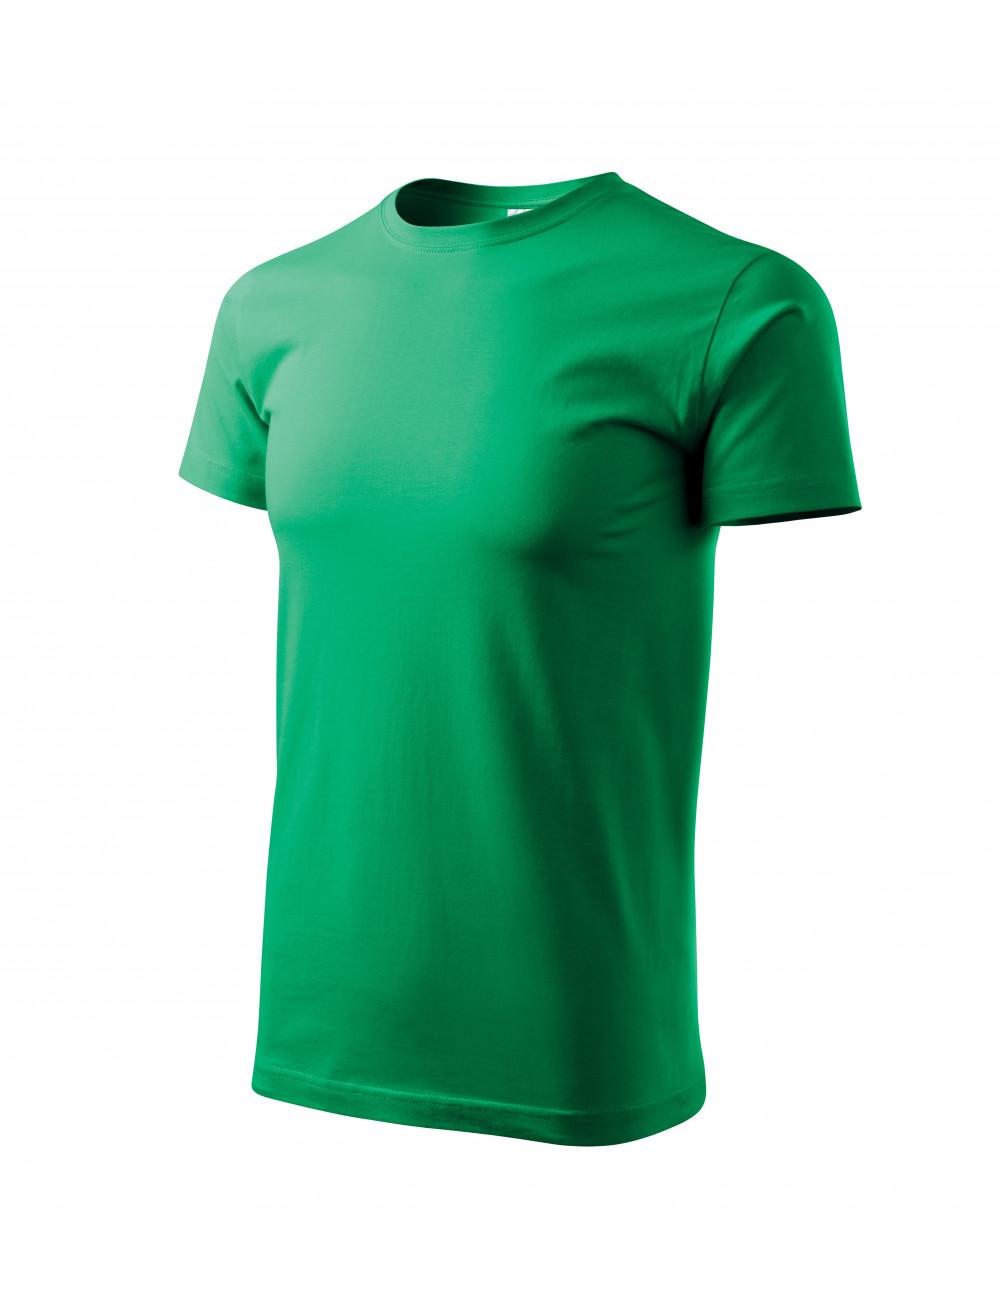 Adler MALFINI Koszulka męska Basic 129 zieleń trawy